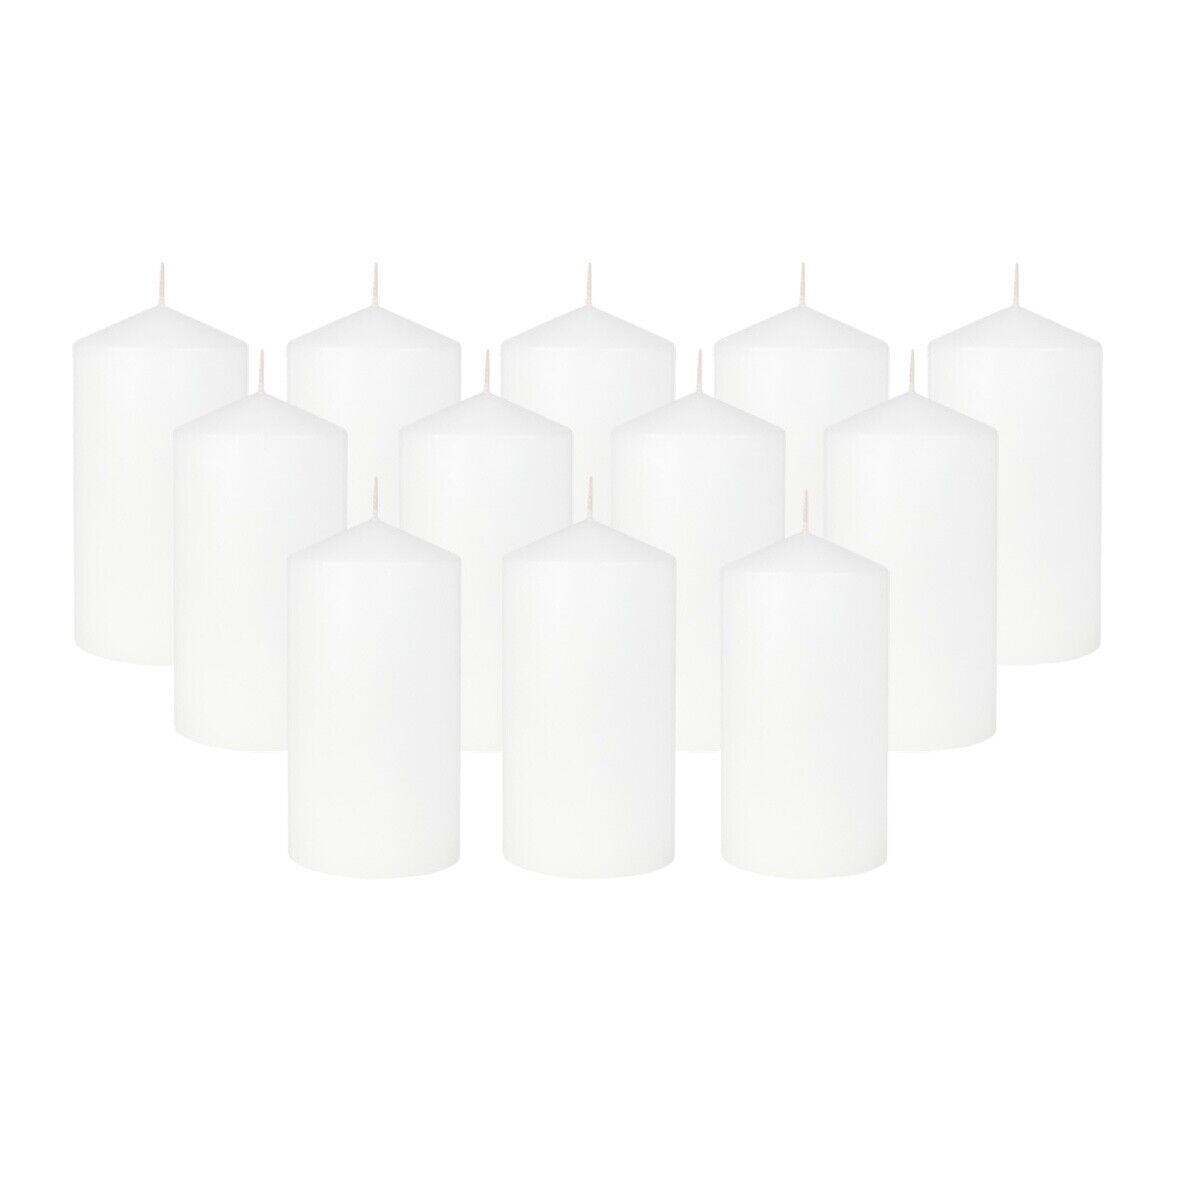 "12-Pack Pillar Candles 3""x6"" for Weddings Home Christmas Spa"